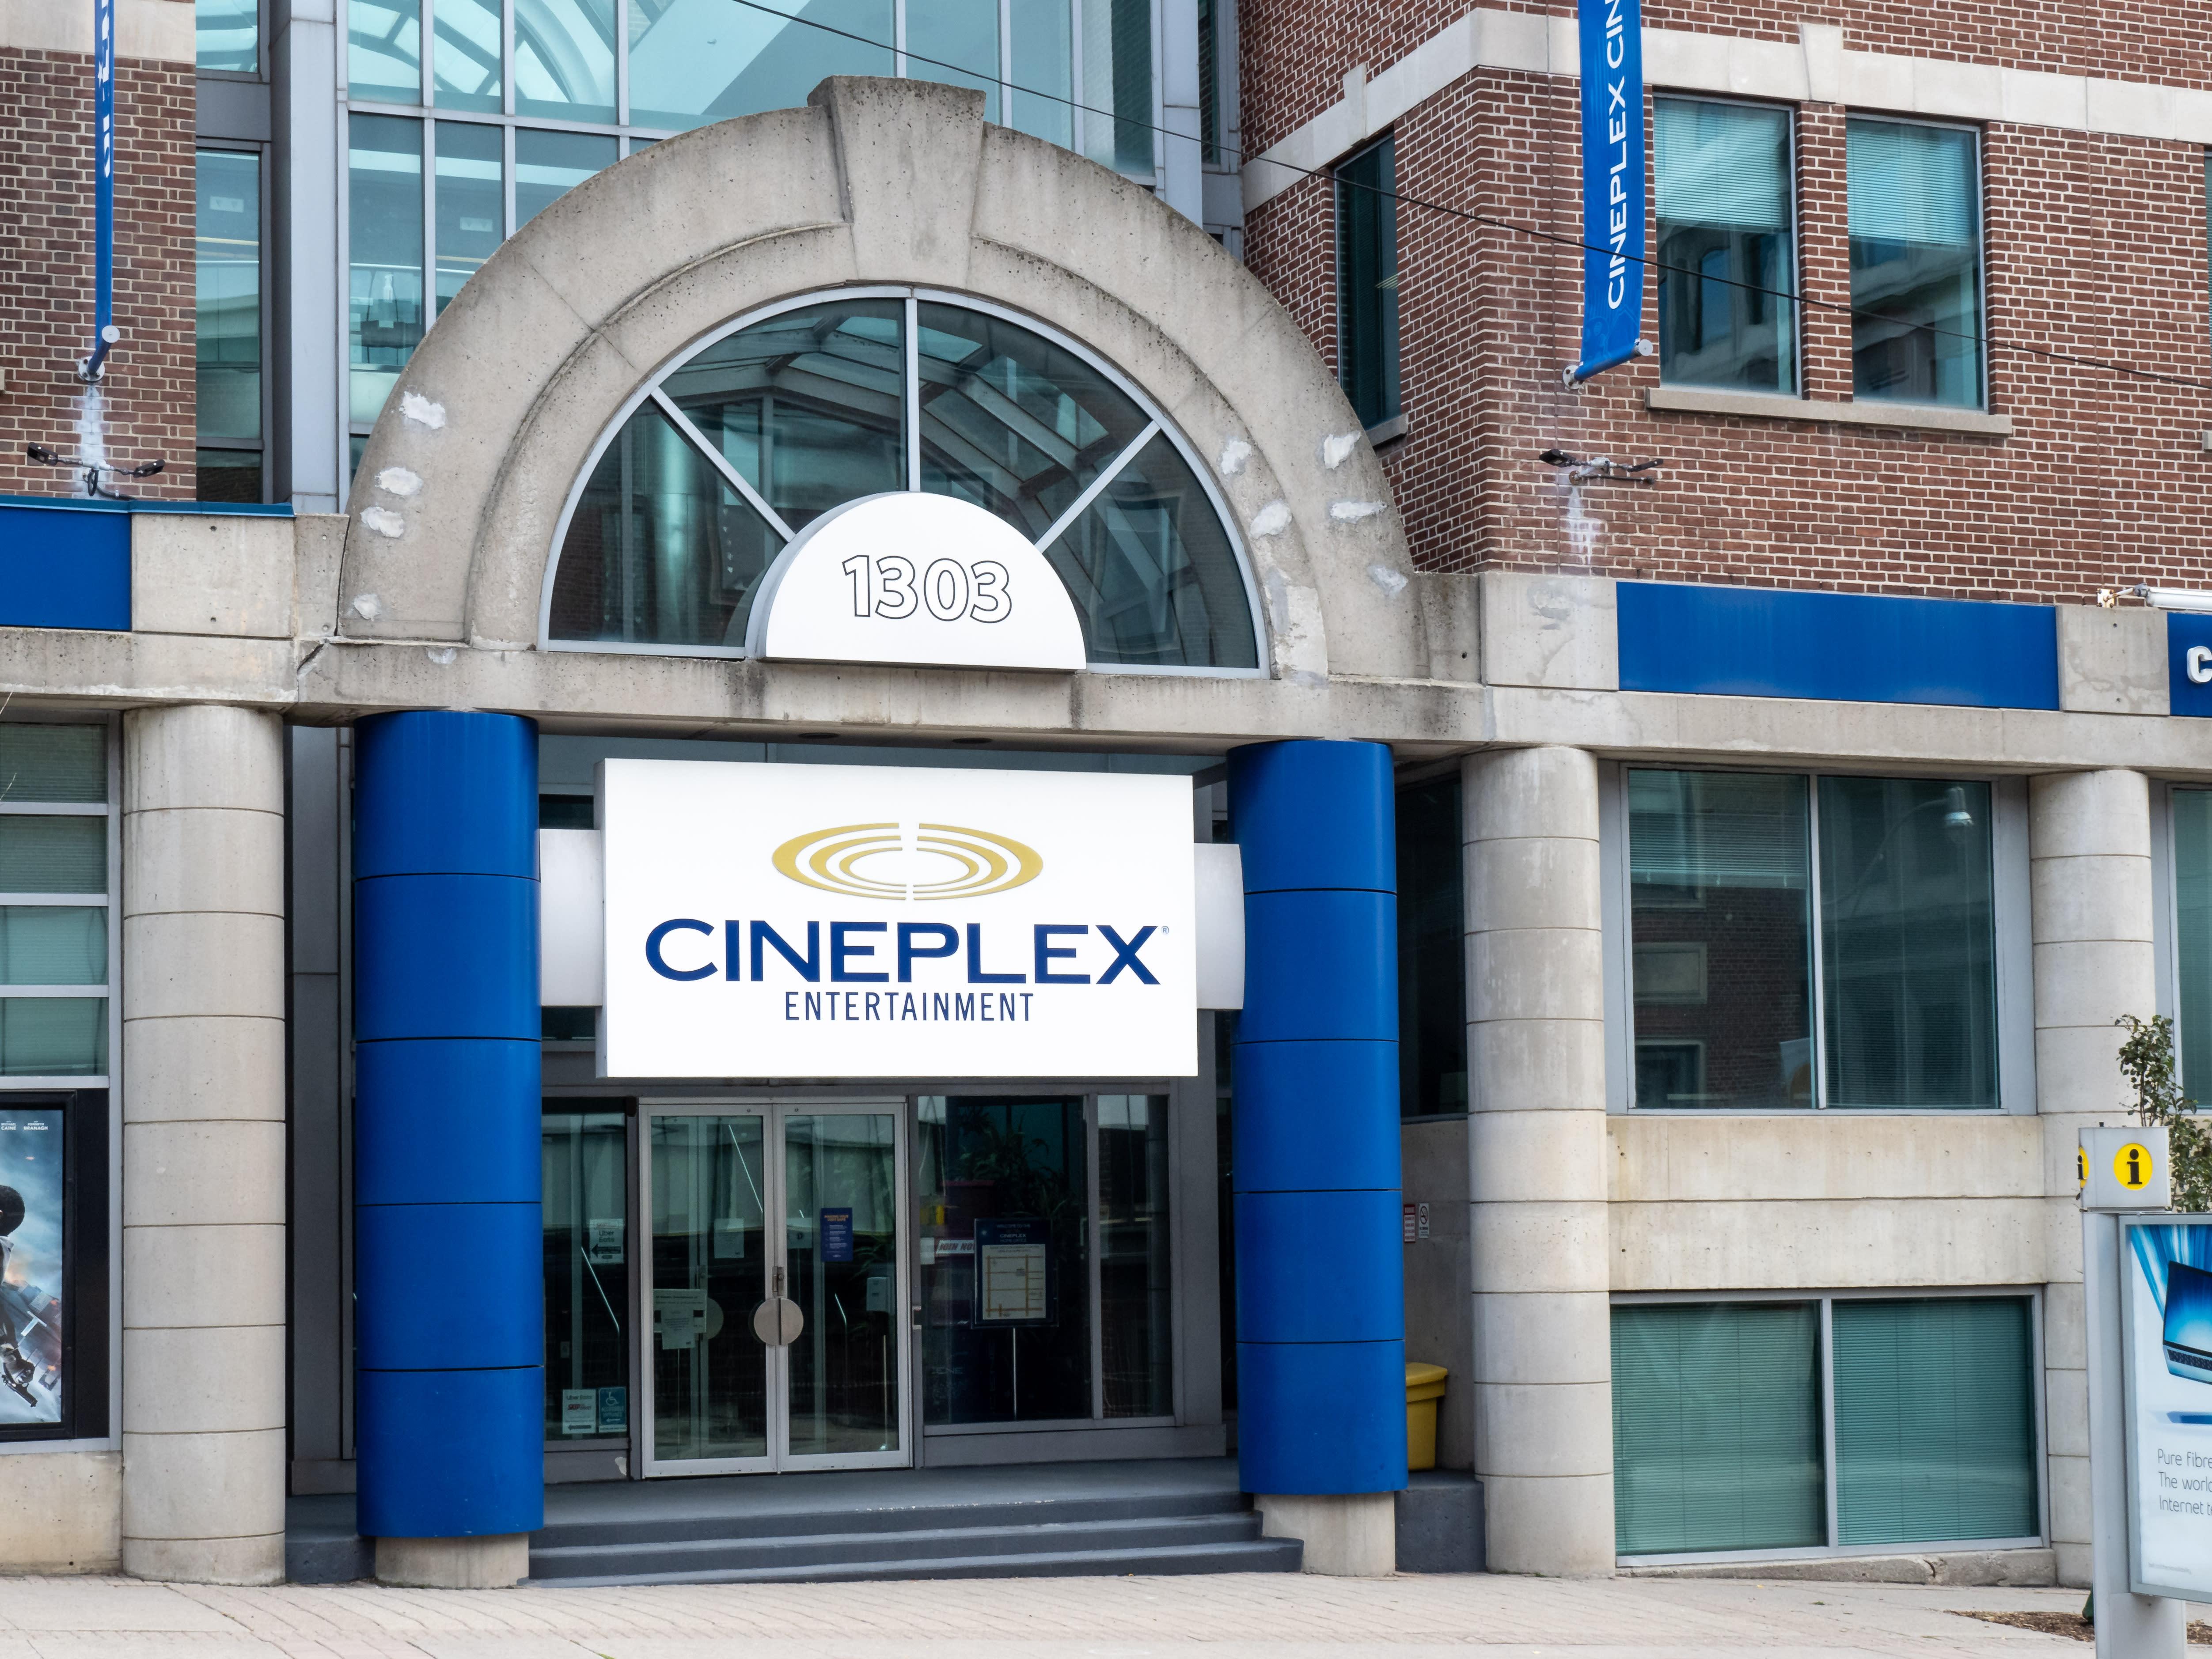 Cineplex CEO calls Ontario's new COVID-19 restrictions 'excessive'  image